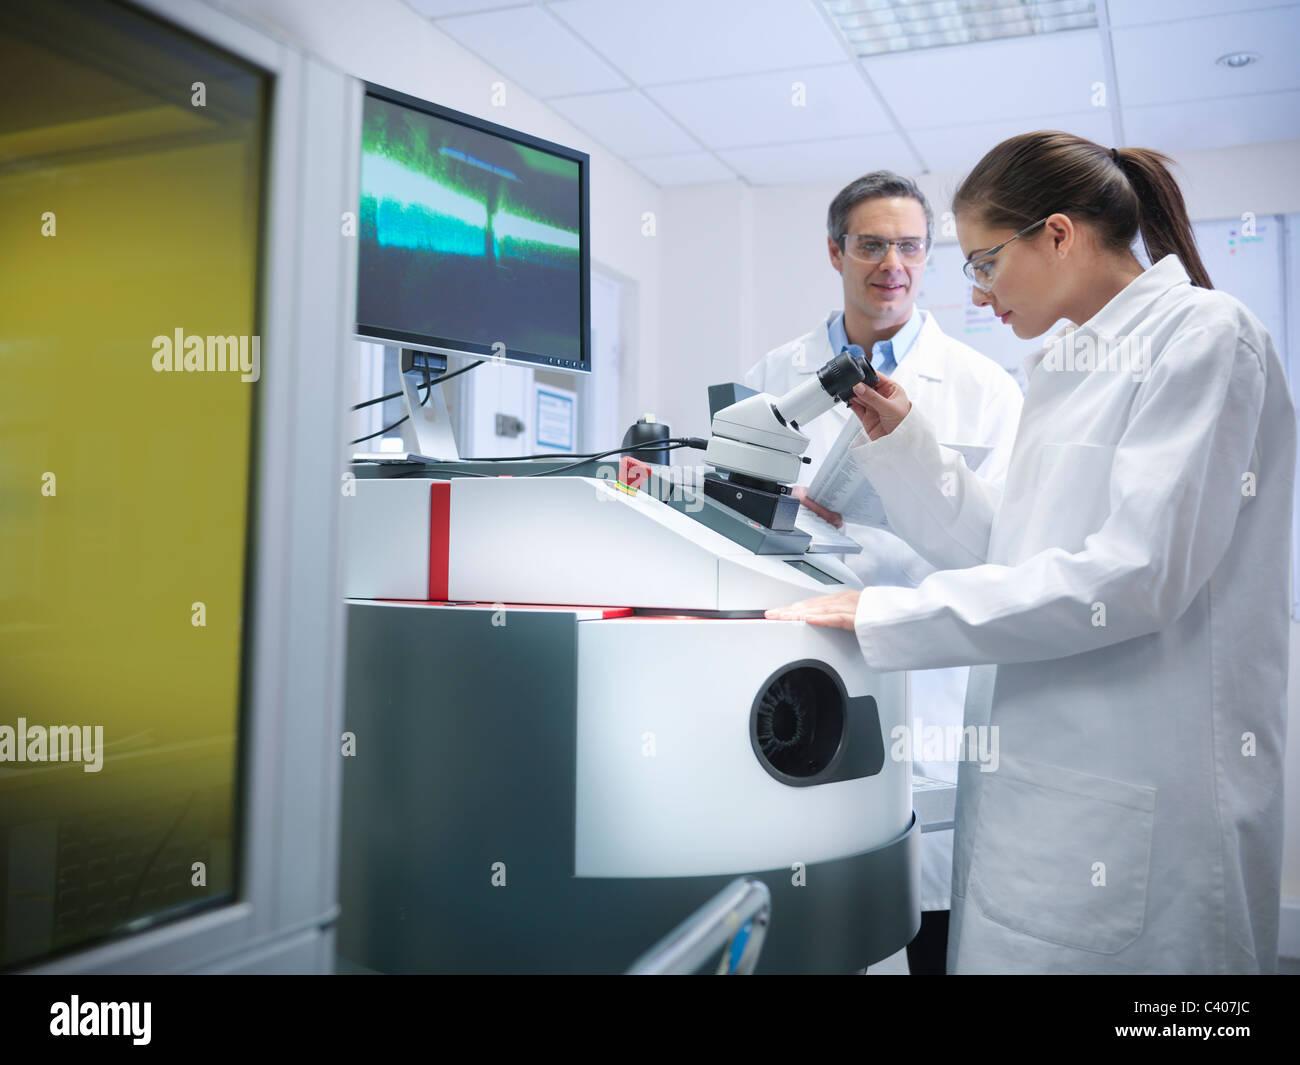 Scientists at laser welding machine - Stock Image